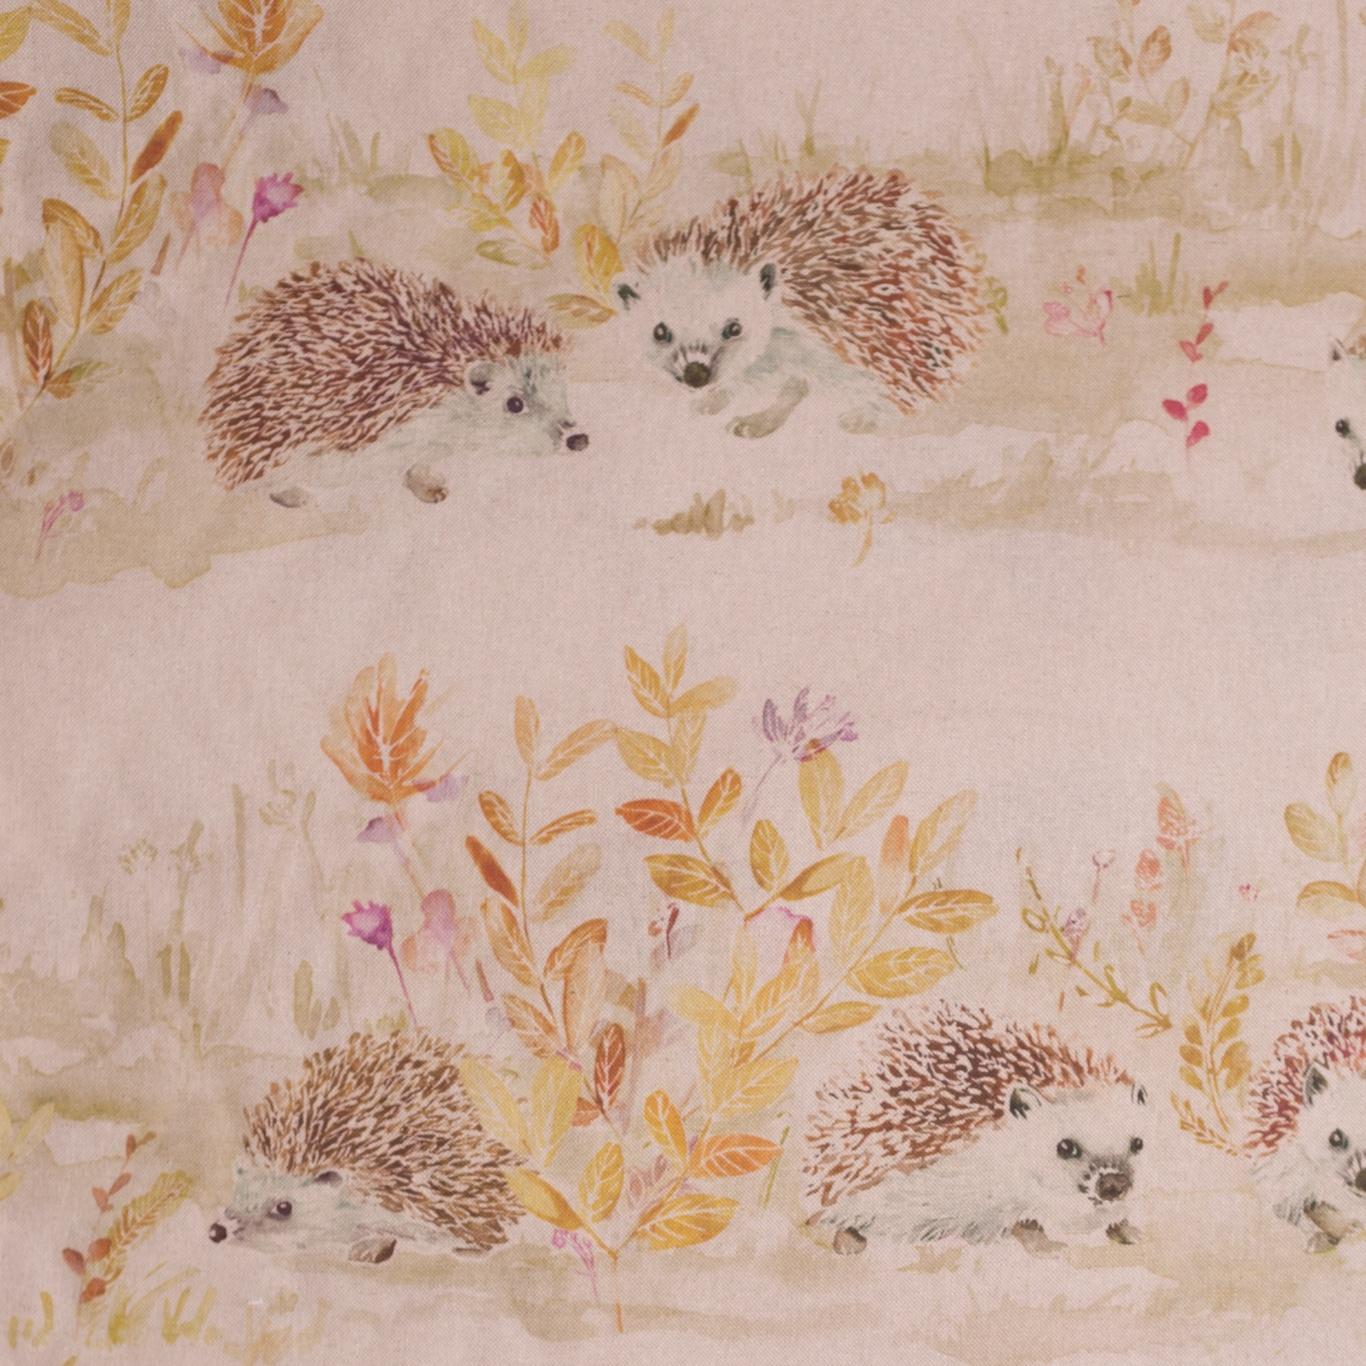 Gordon Smith Malvern Ltd Voyage Mr And Mrs Hedgehog